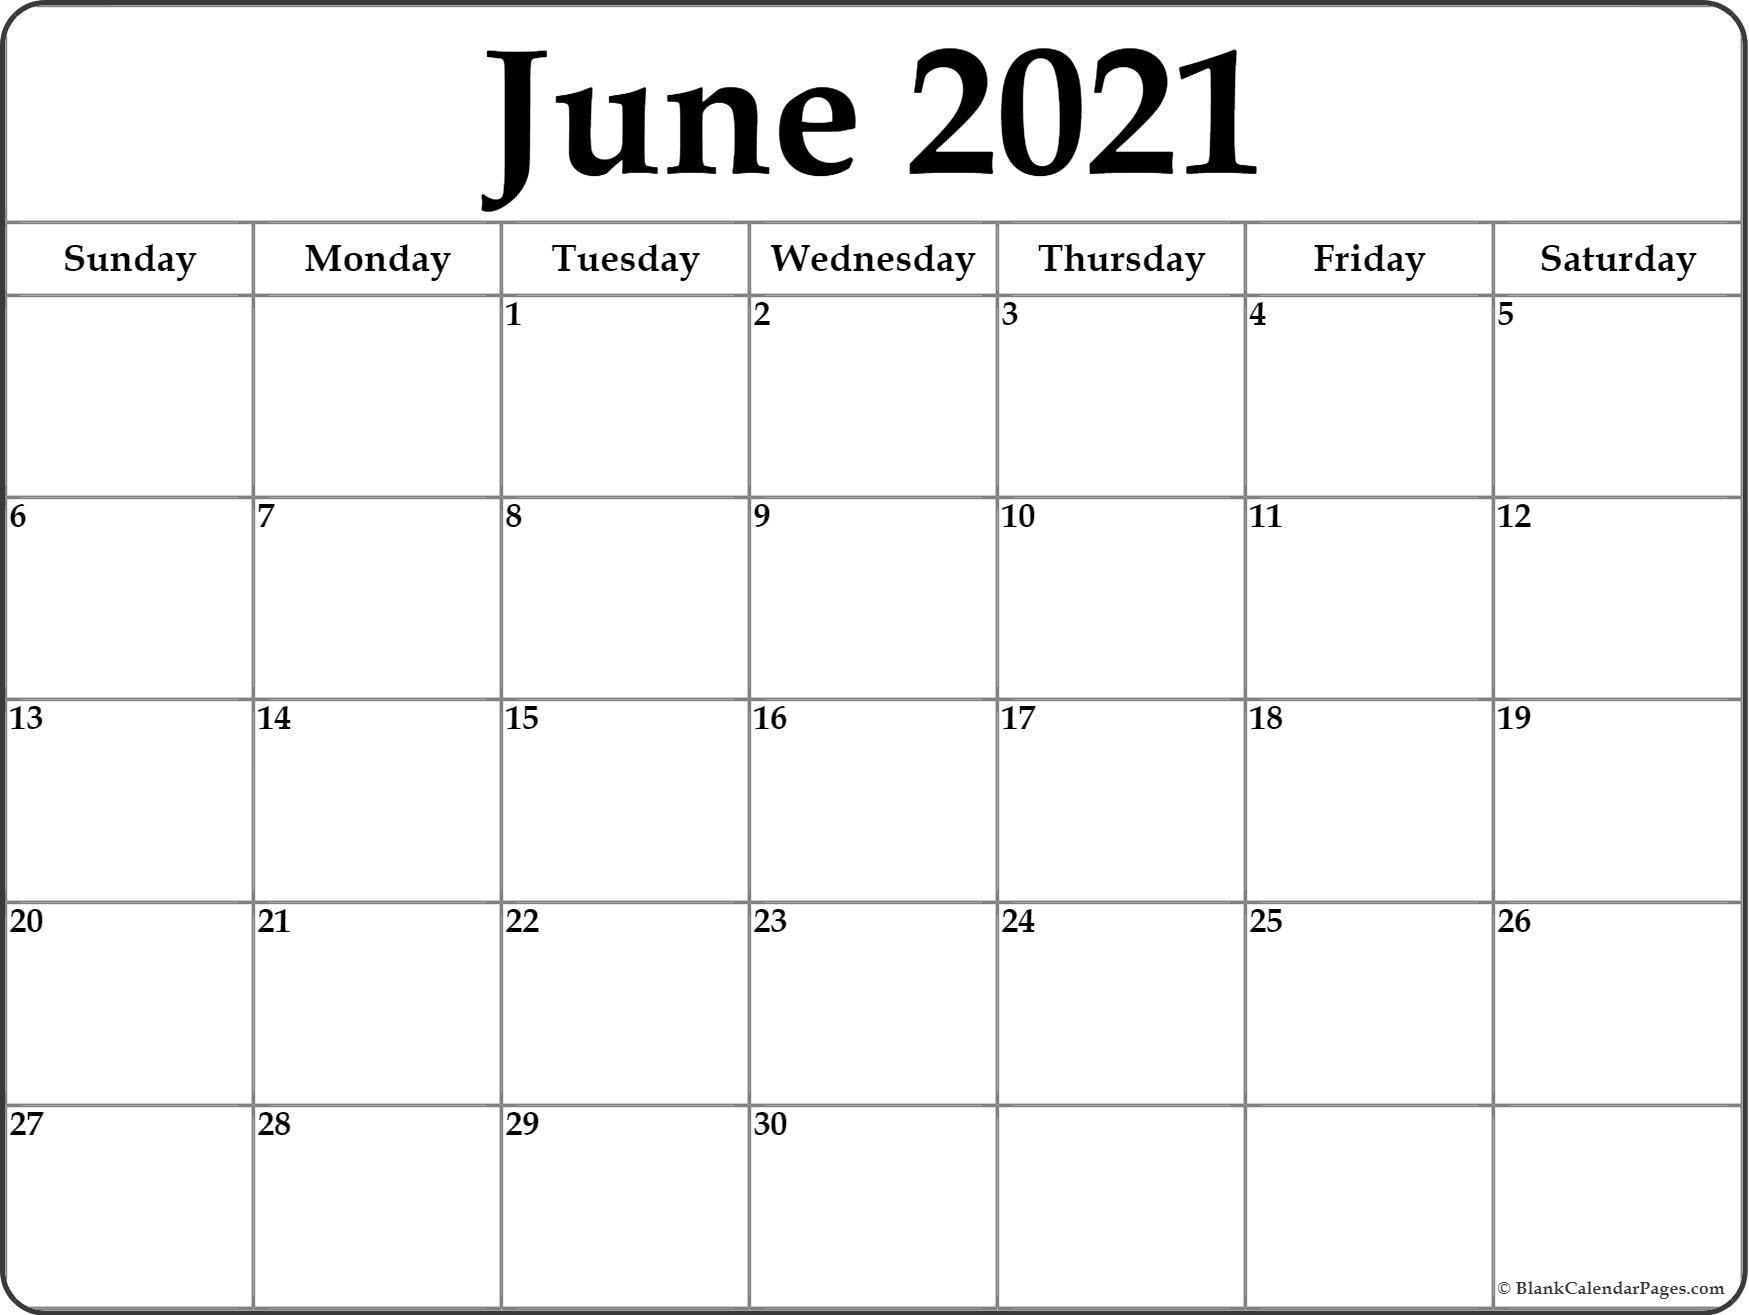 June 2021 Printable Monthly Calendar   Monthly Calendar June 2021 Calendar Panchang